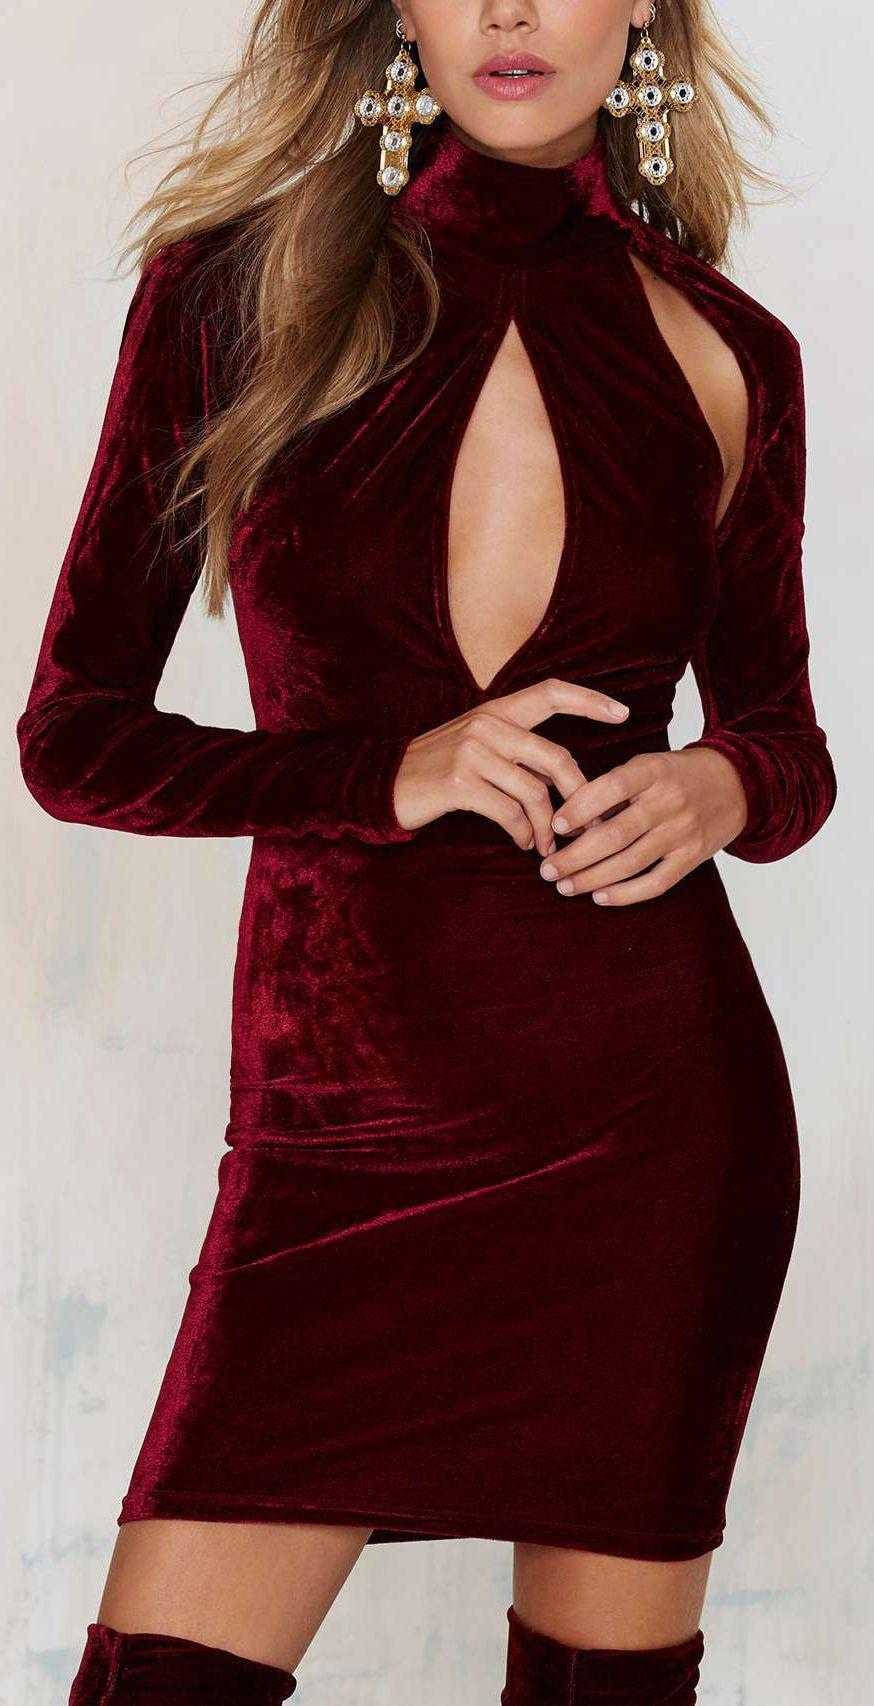 Oxblood Velvet Dress Vestidos De Terciopelo Mini